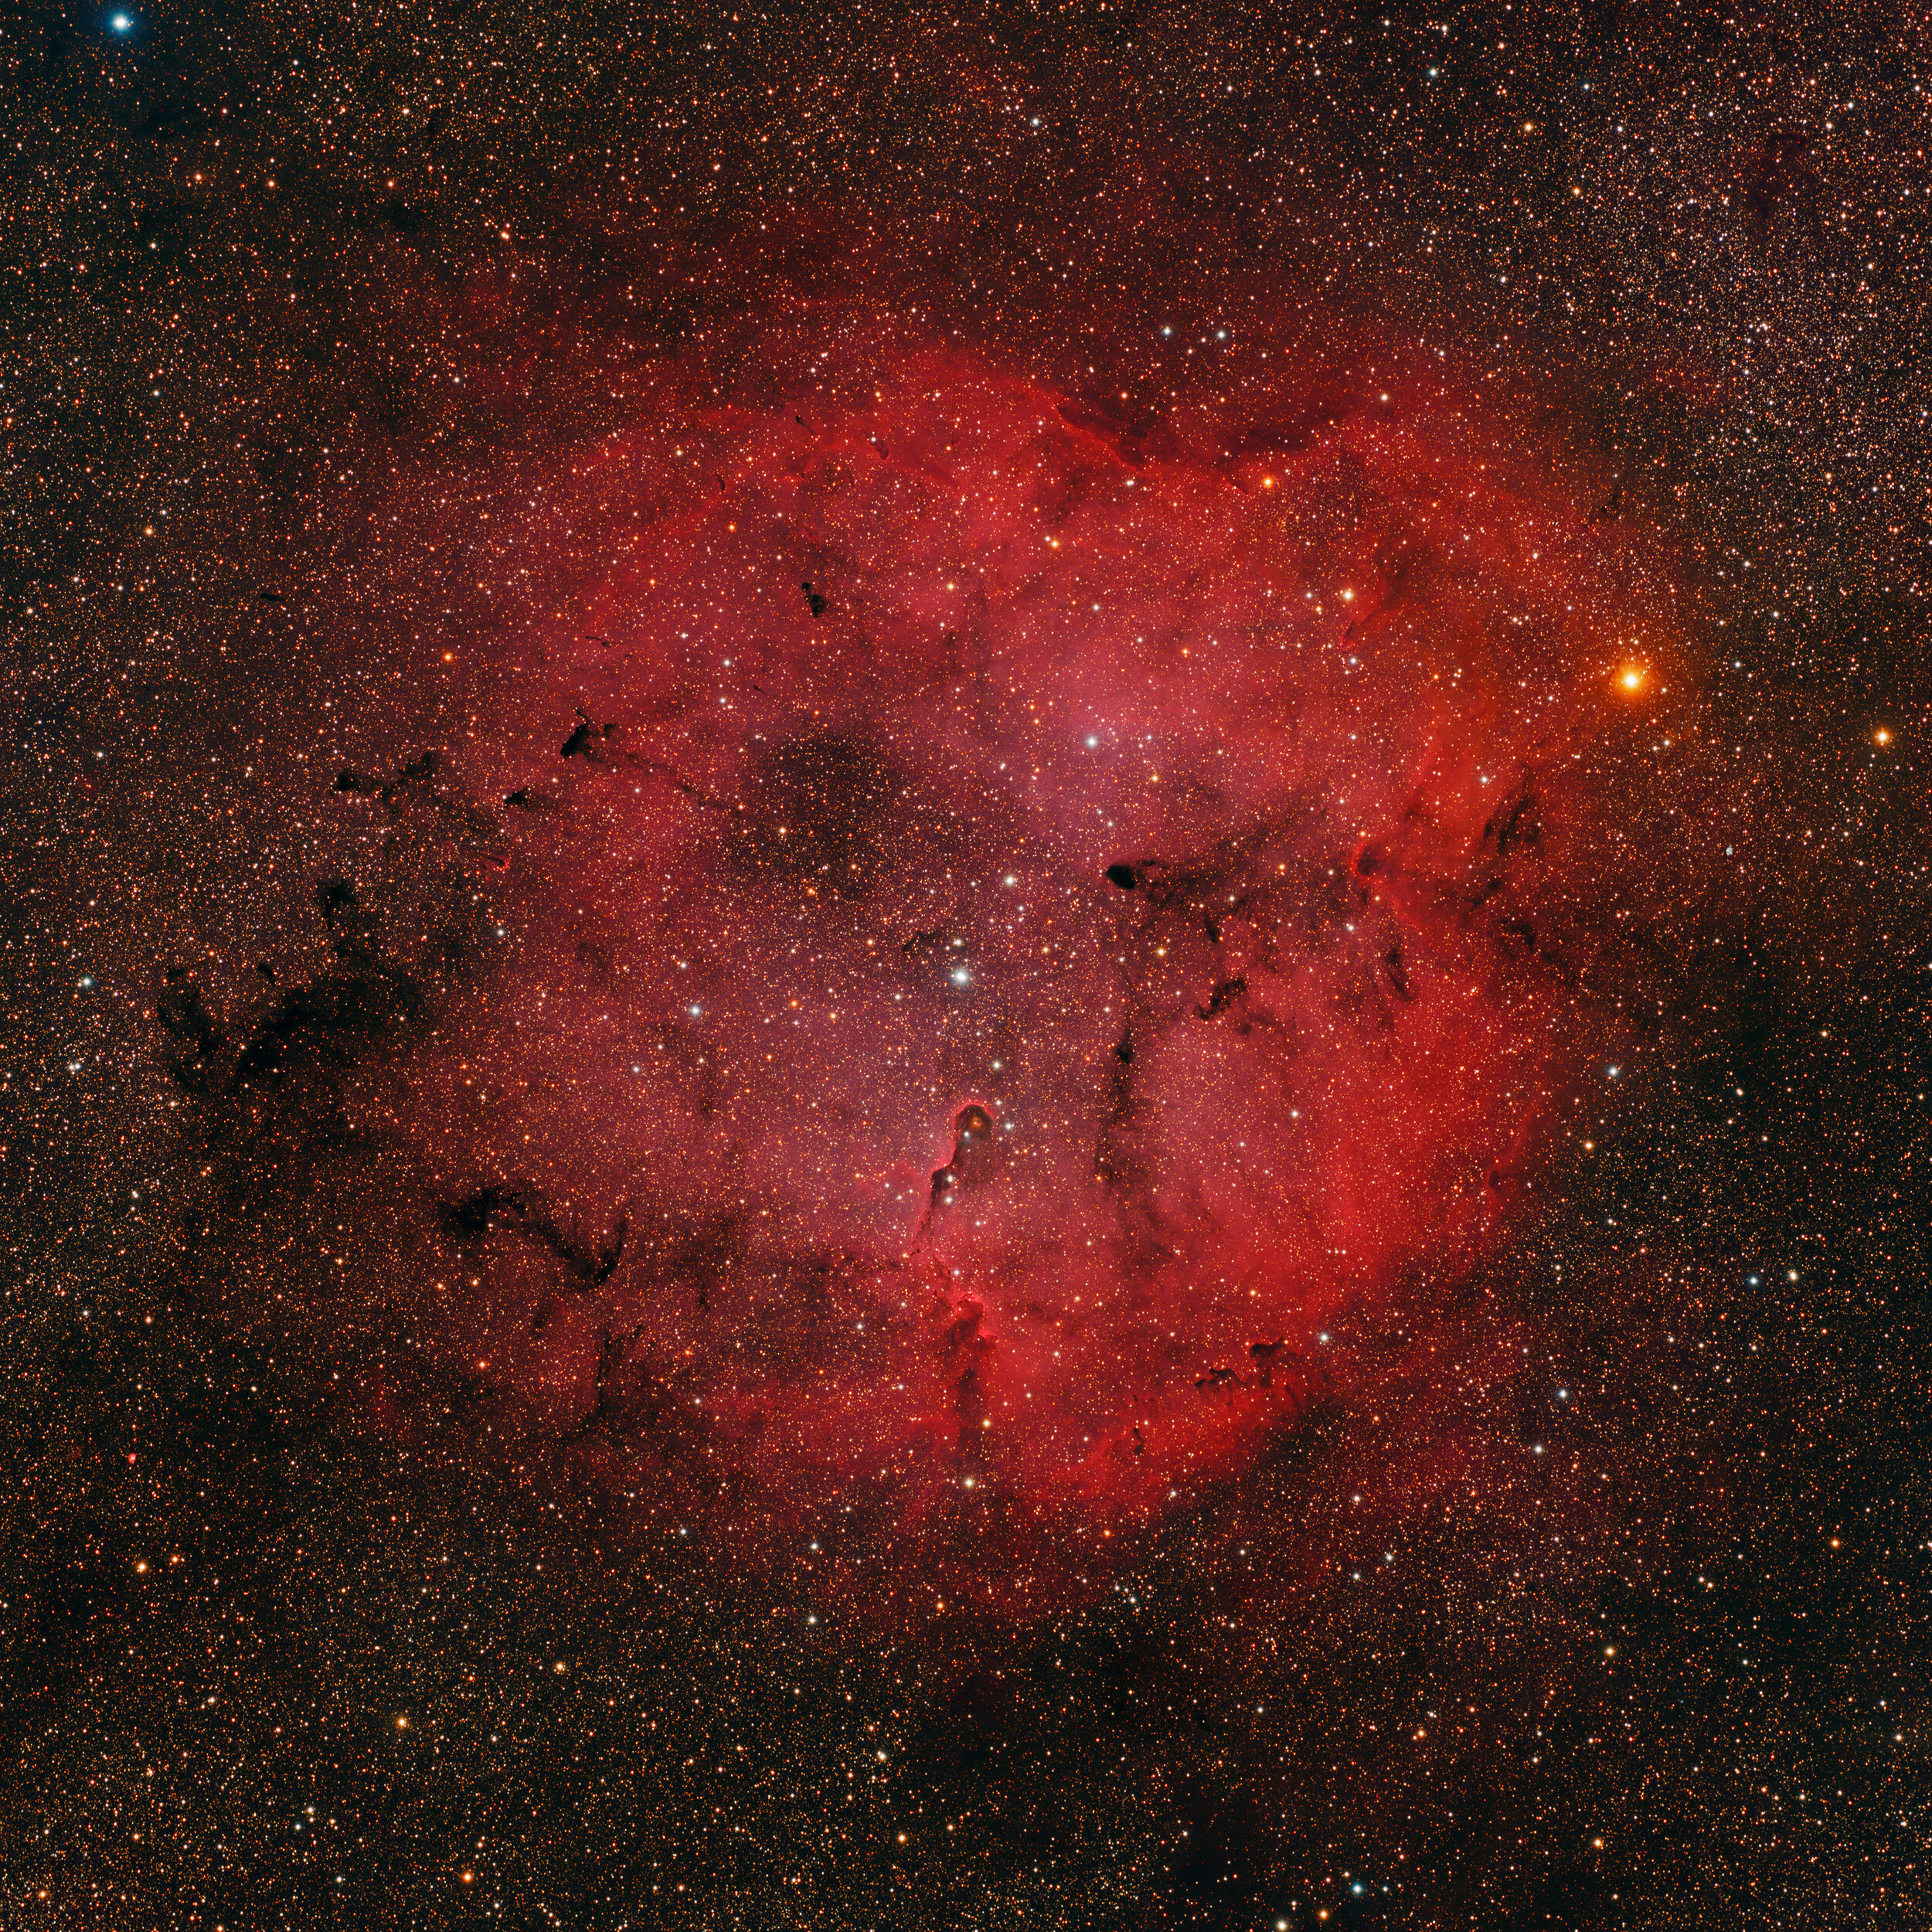 IC 1396 in Cepheus Astrophotography Martin Rusterholz